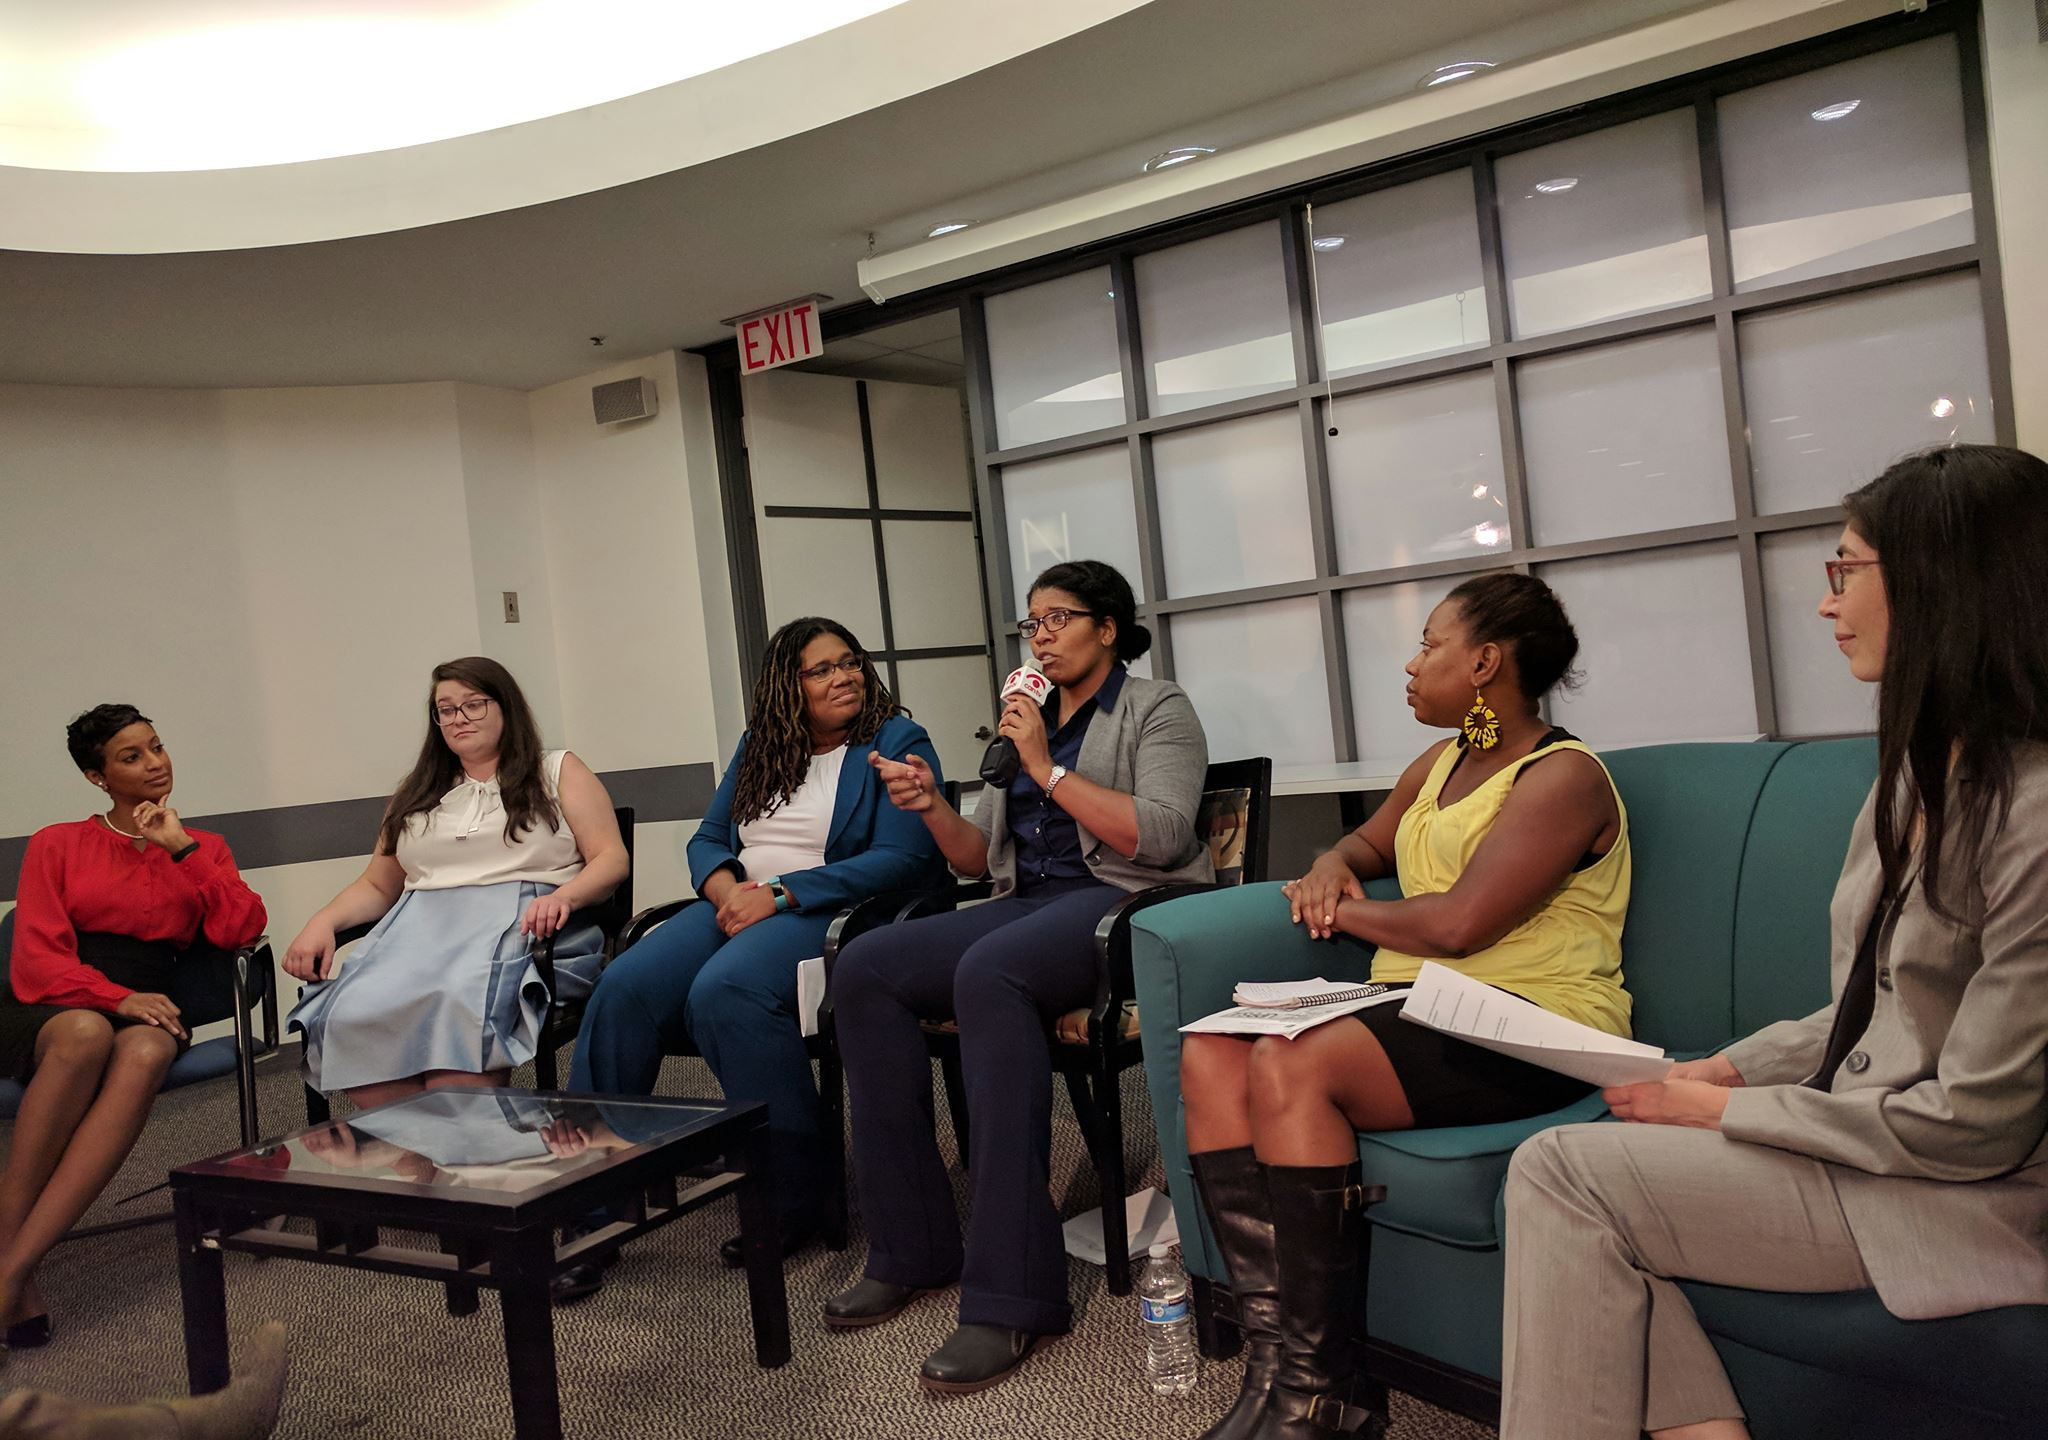 APA-IL Diversity Panel - October 5, 2017 (photo by Justin Keller)